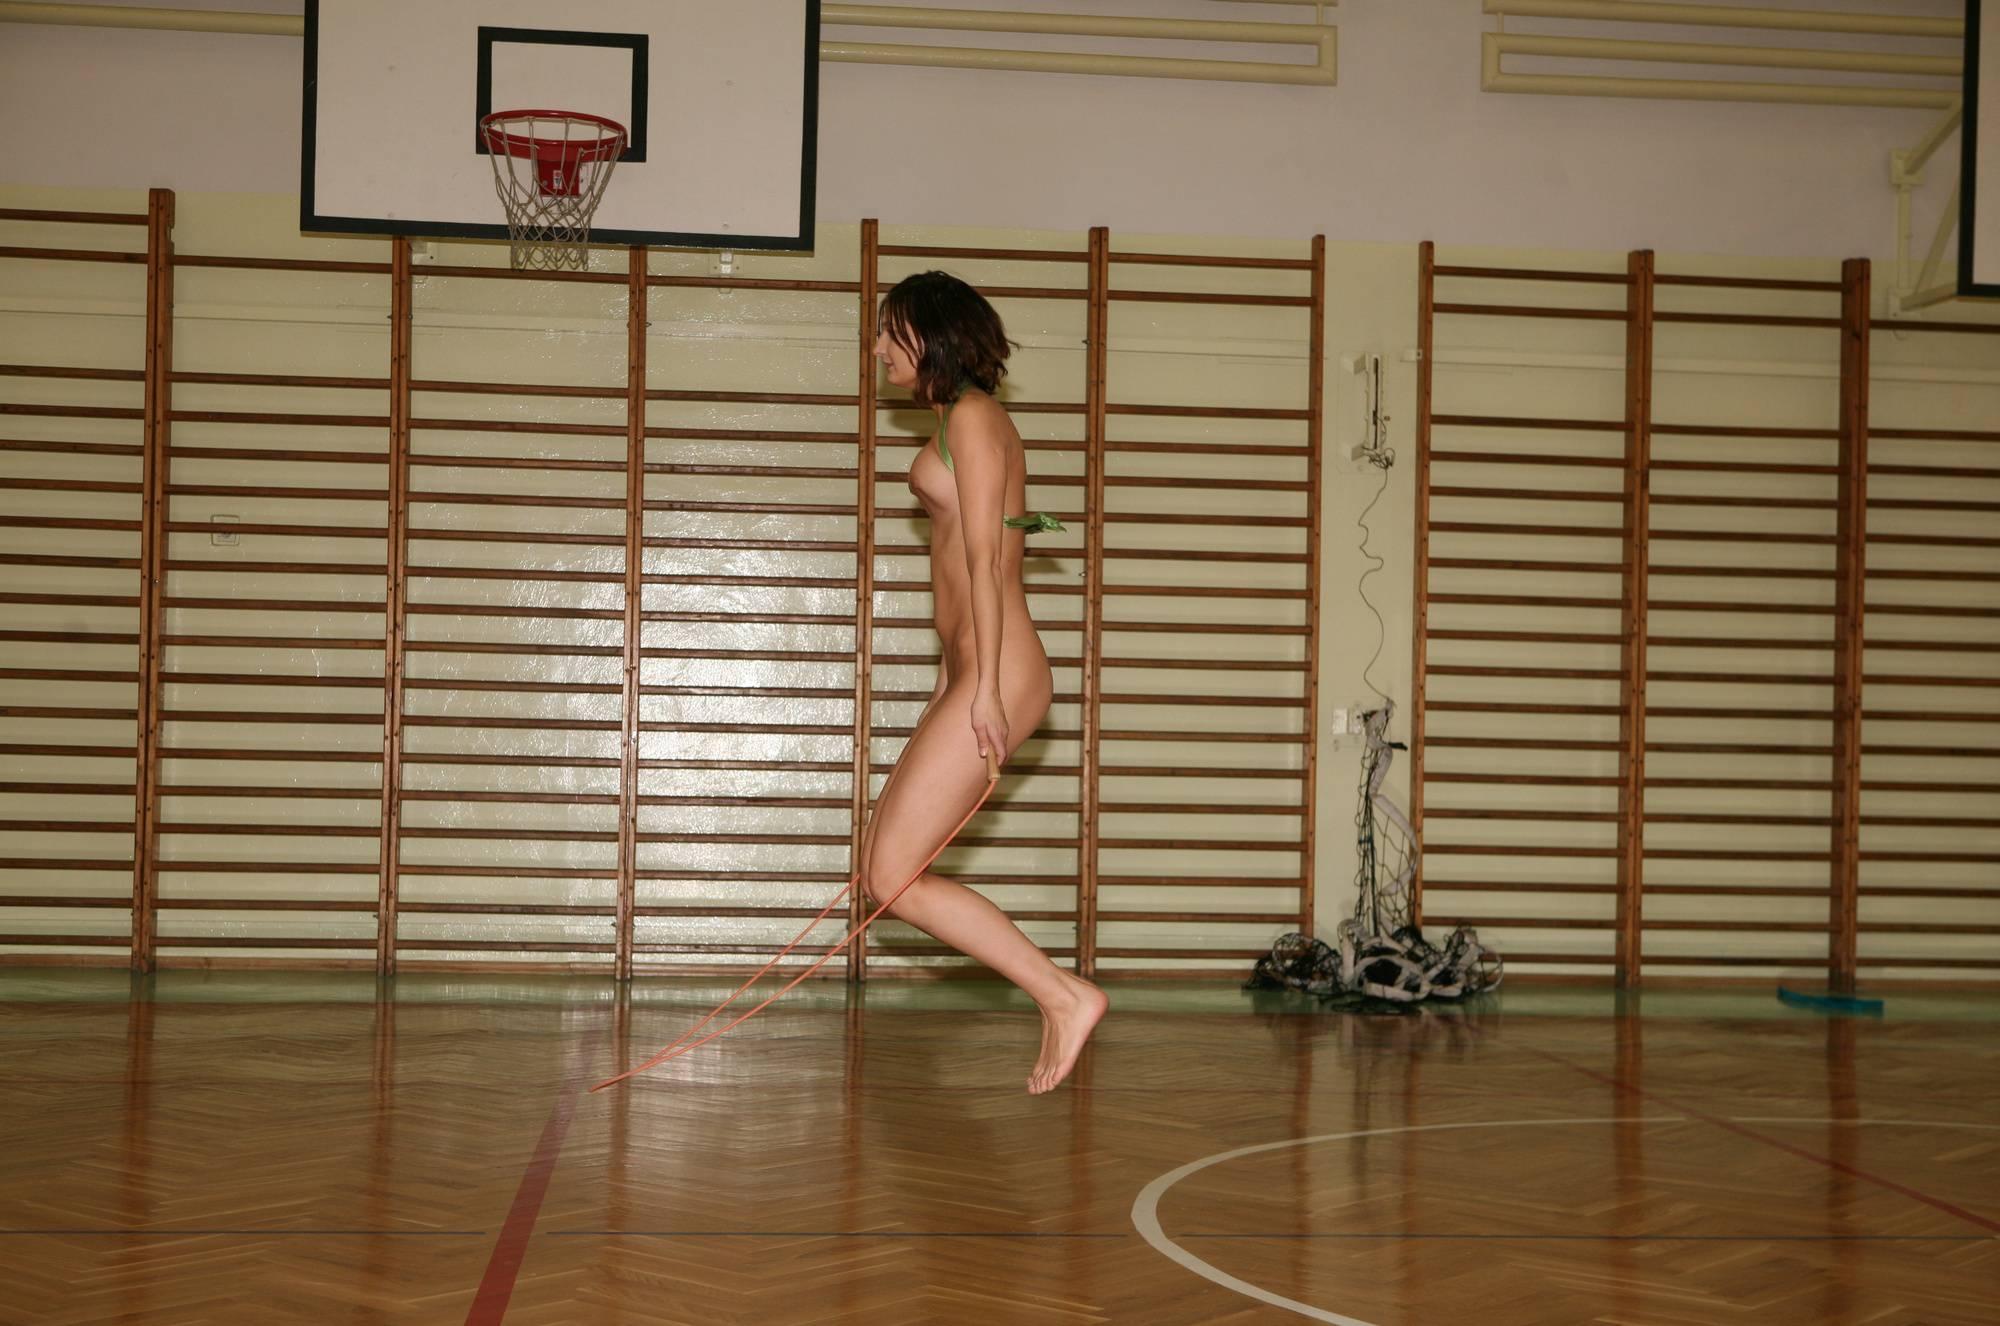 Gym Jumping Girl Groups - 1